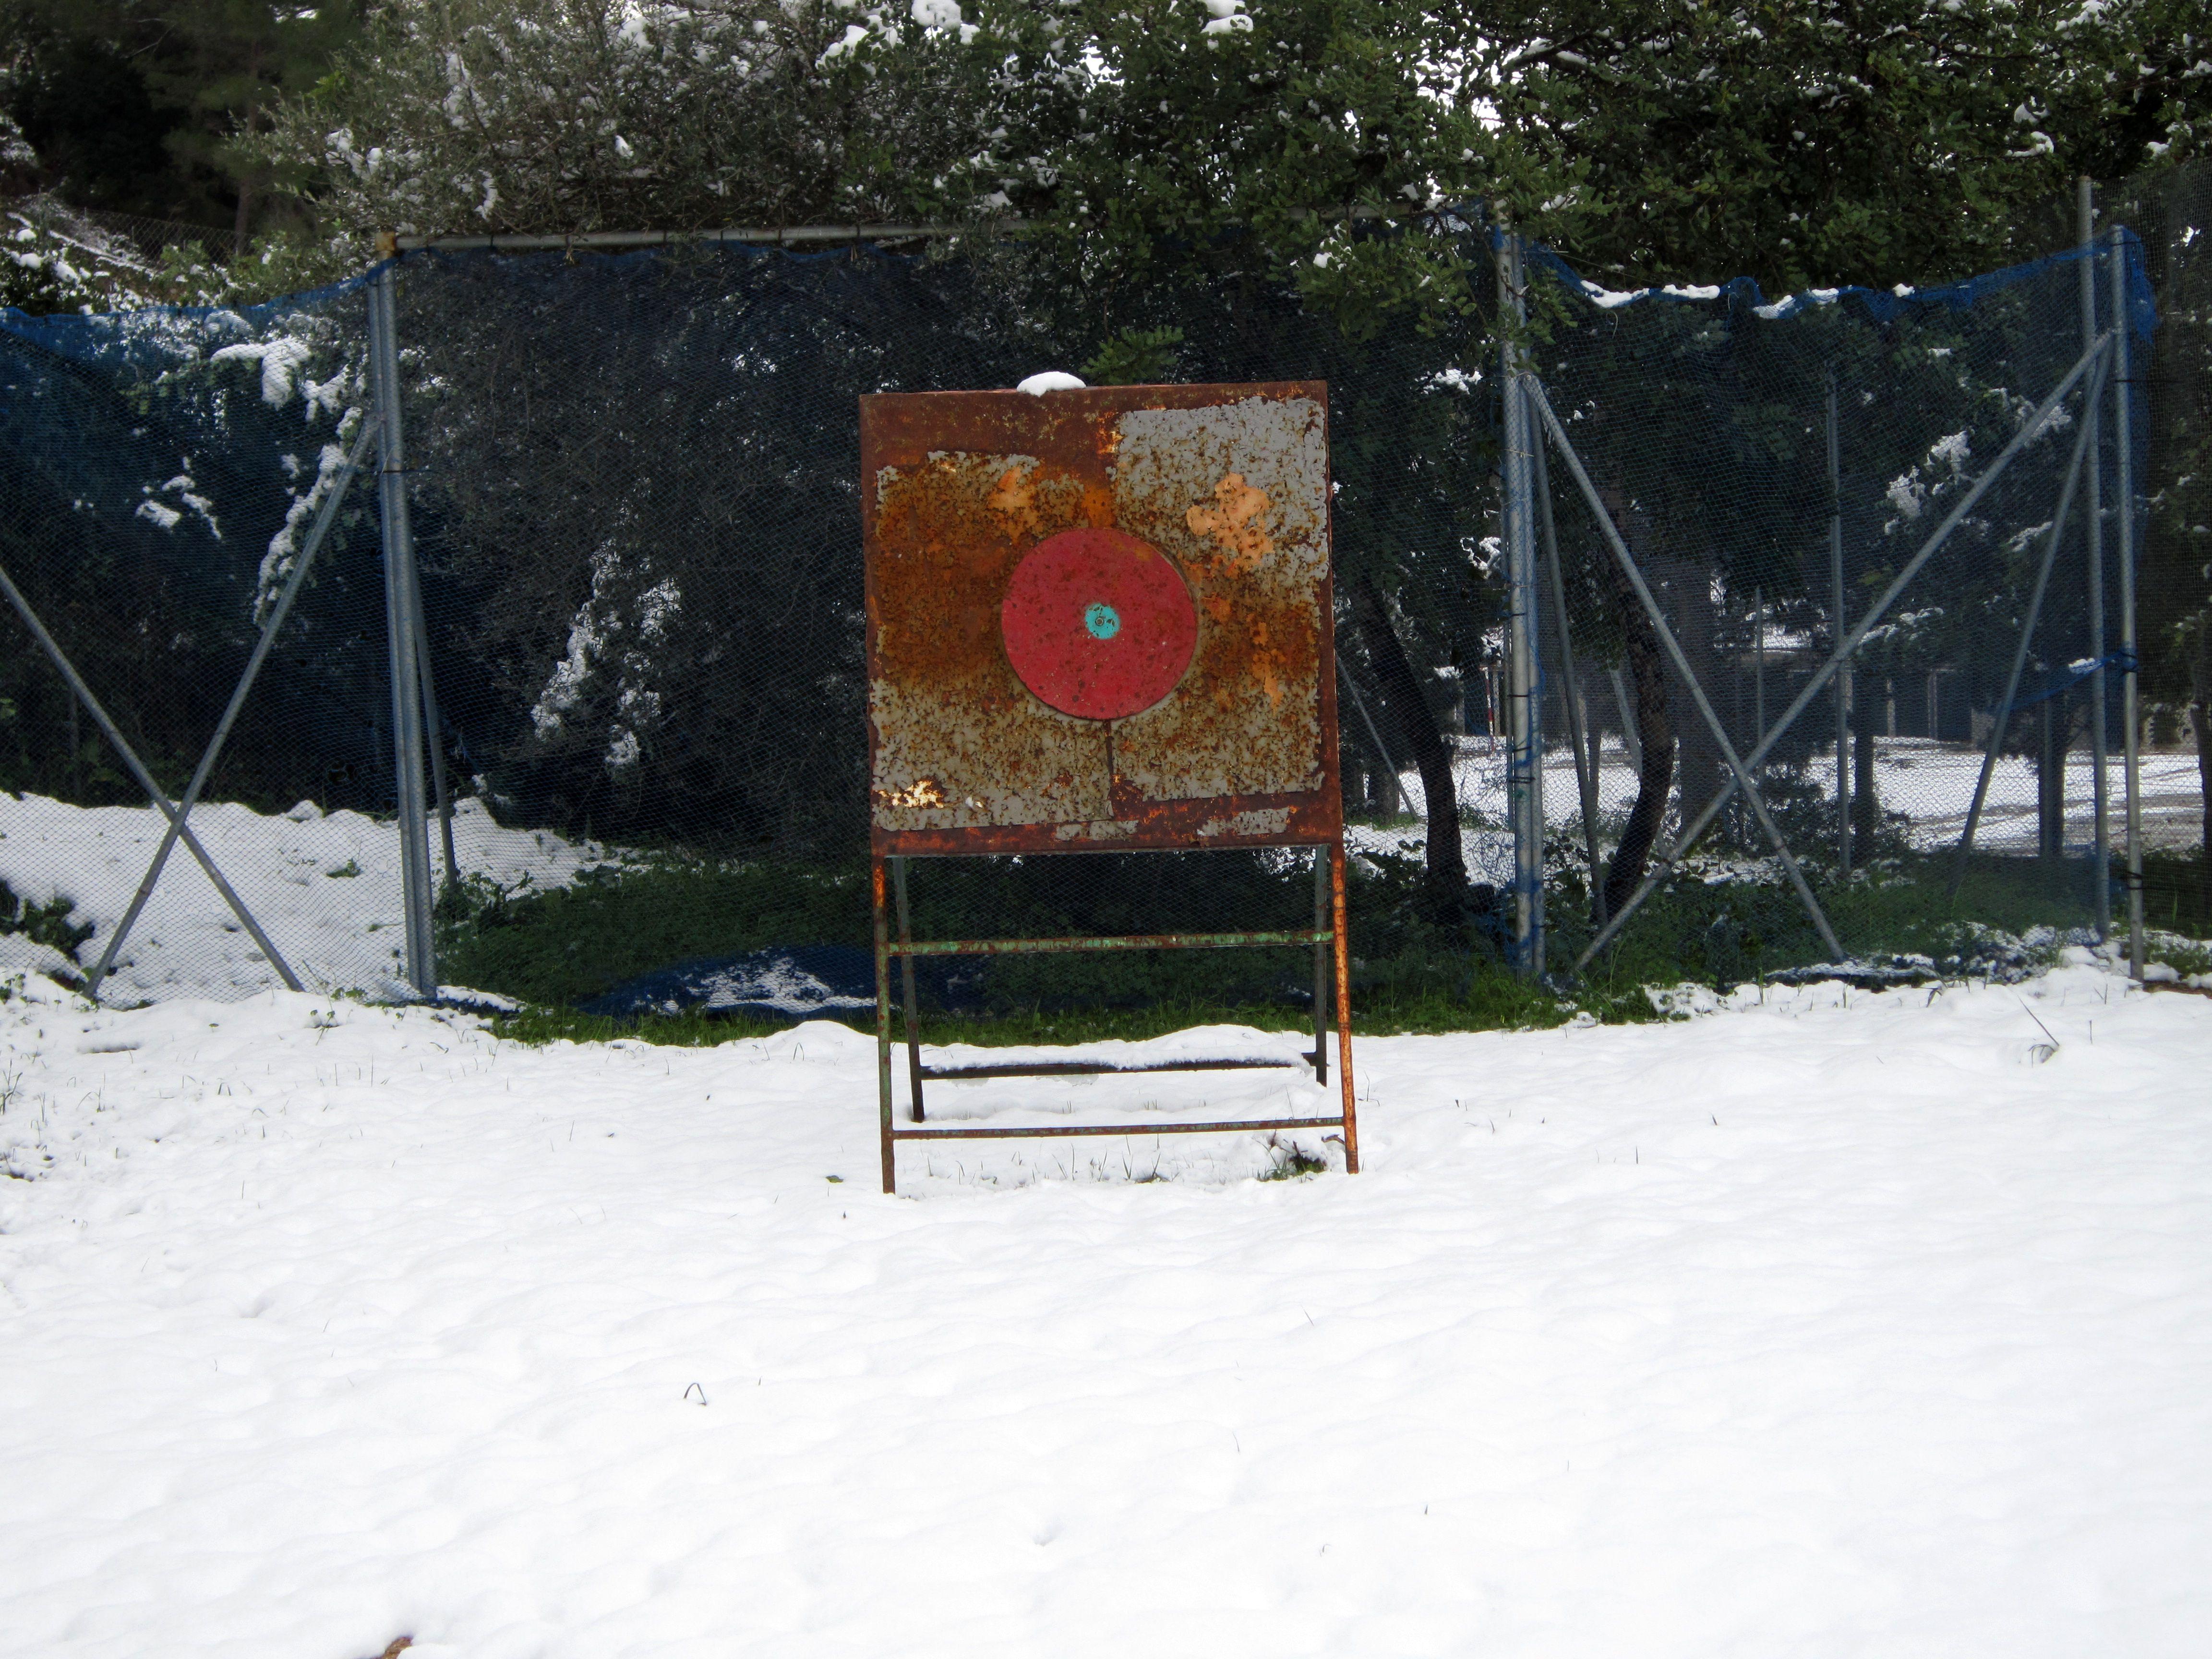 Camp Municipal Esports Jaume Oliver i Sastre - Nevada 03-02-2012.-